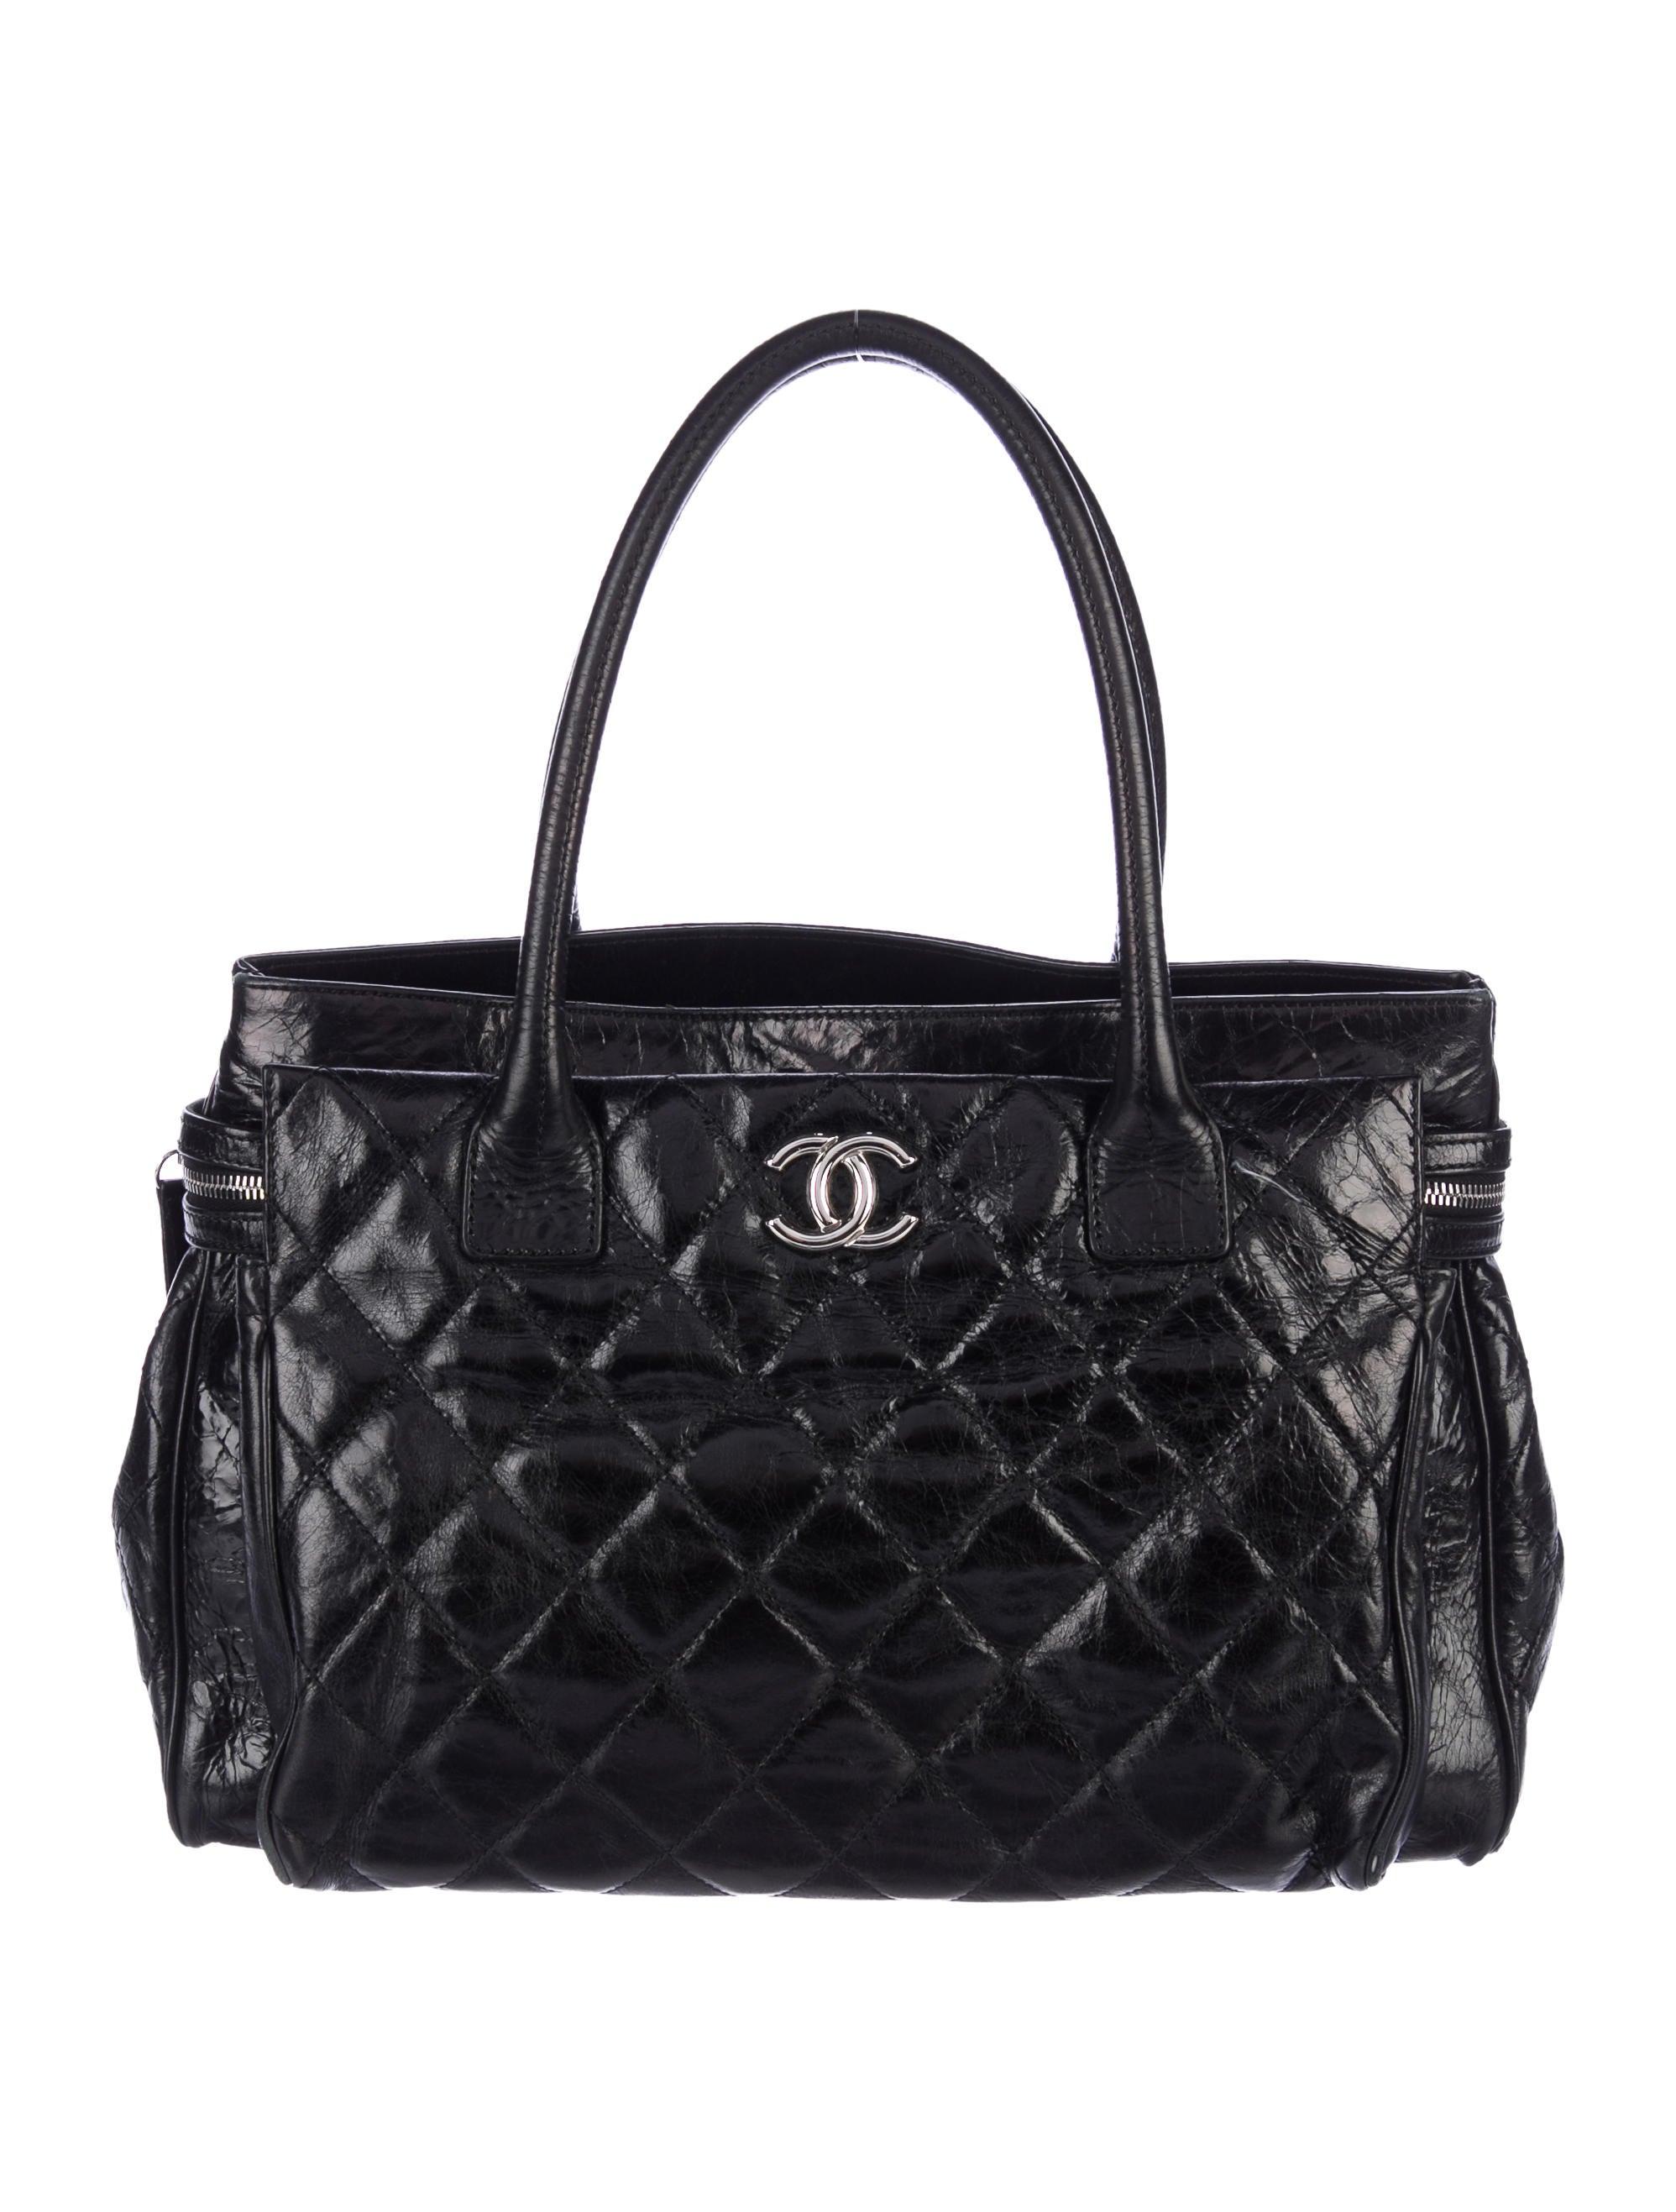 Chanel Glazed Calfskin New Portobello Tote - Handbags - CHA217234 ...